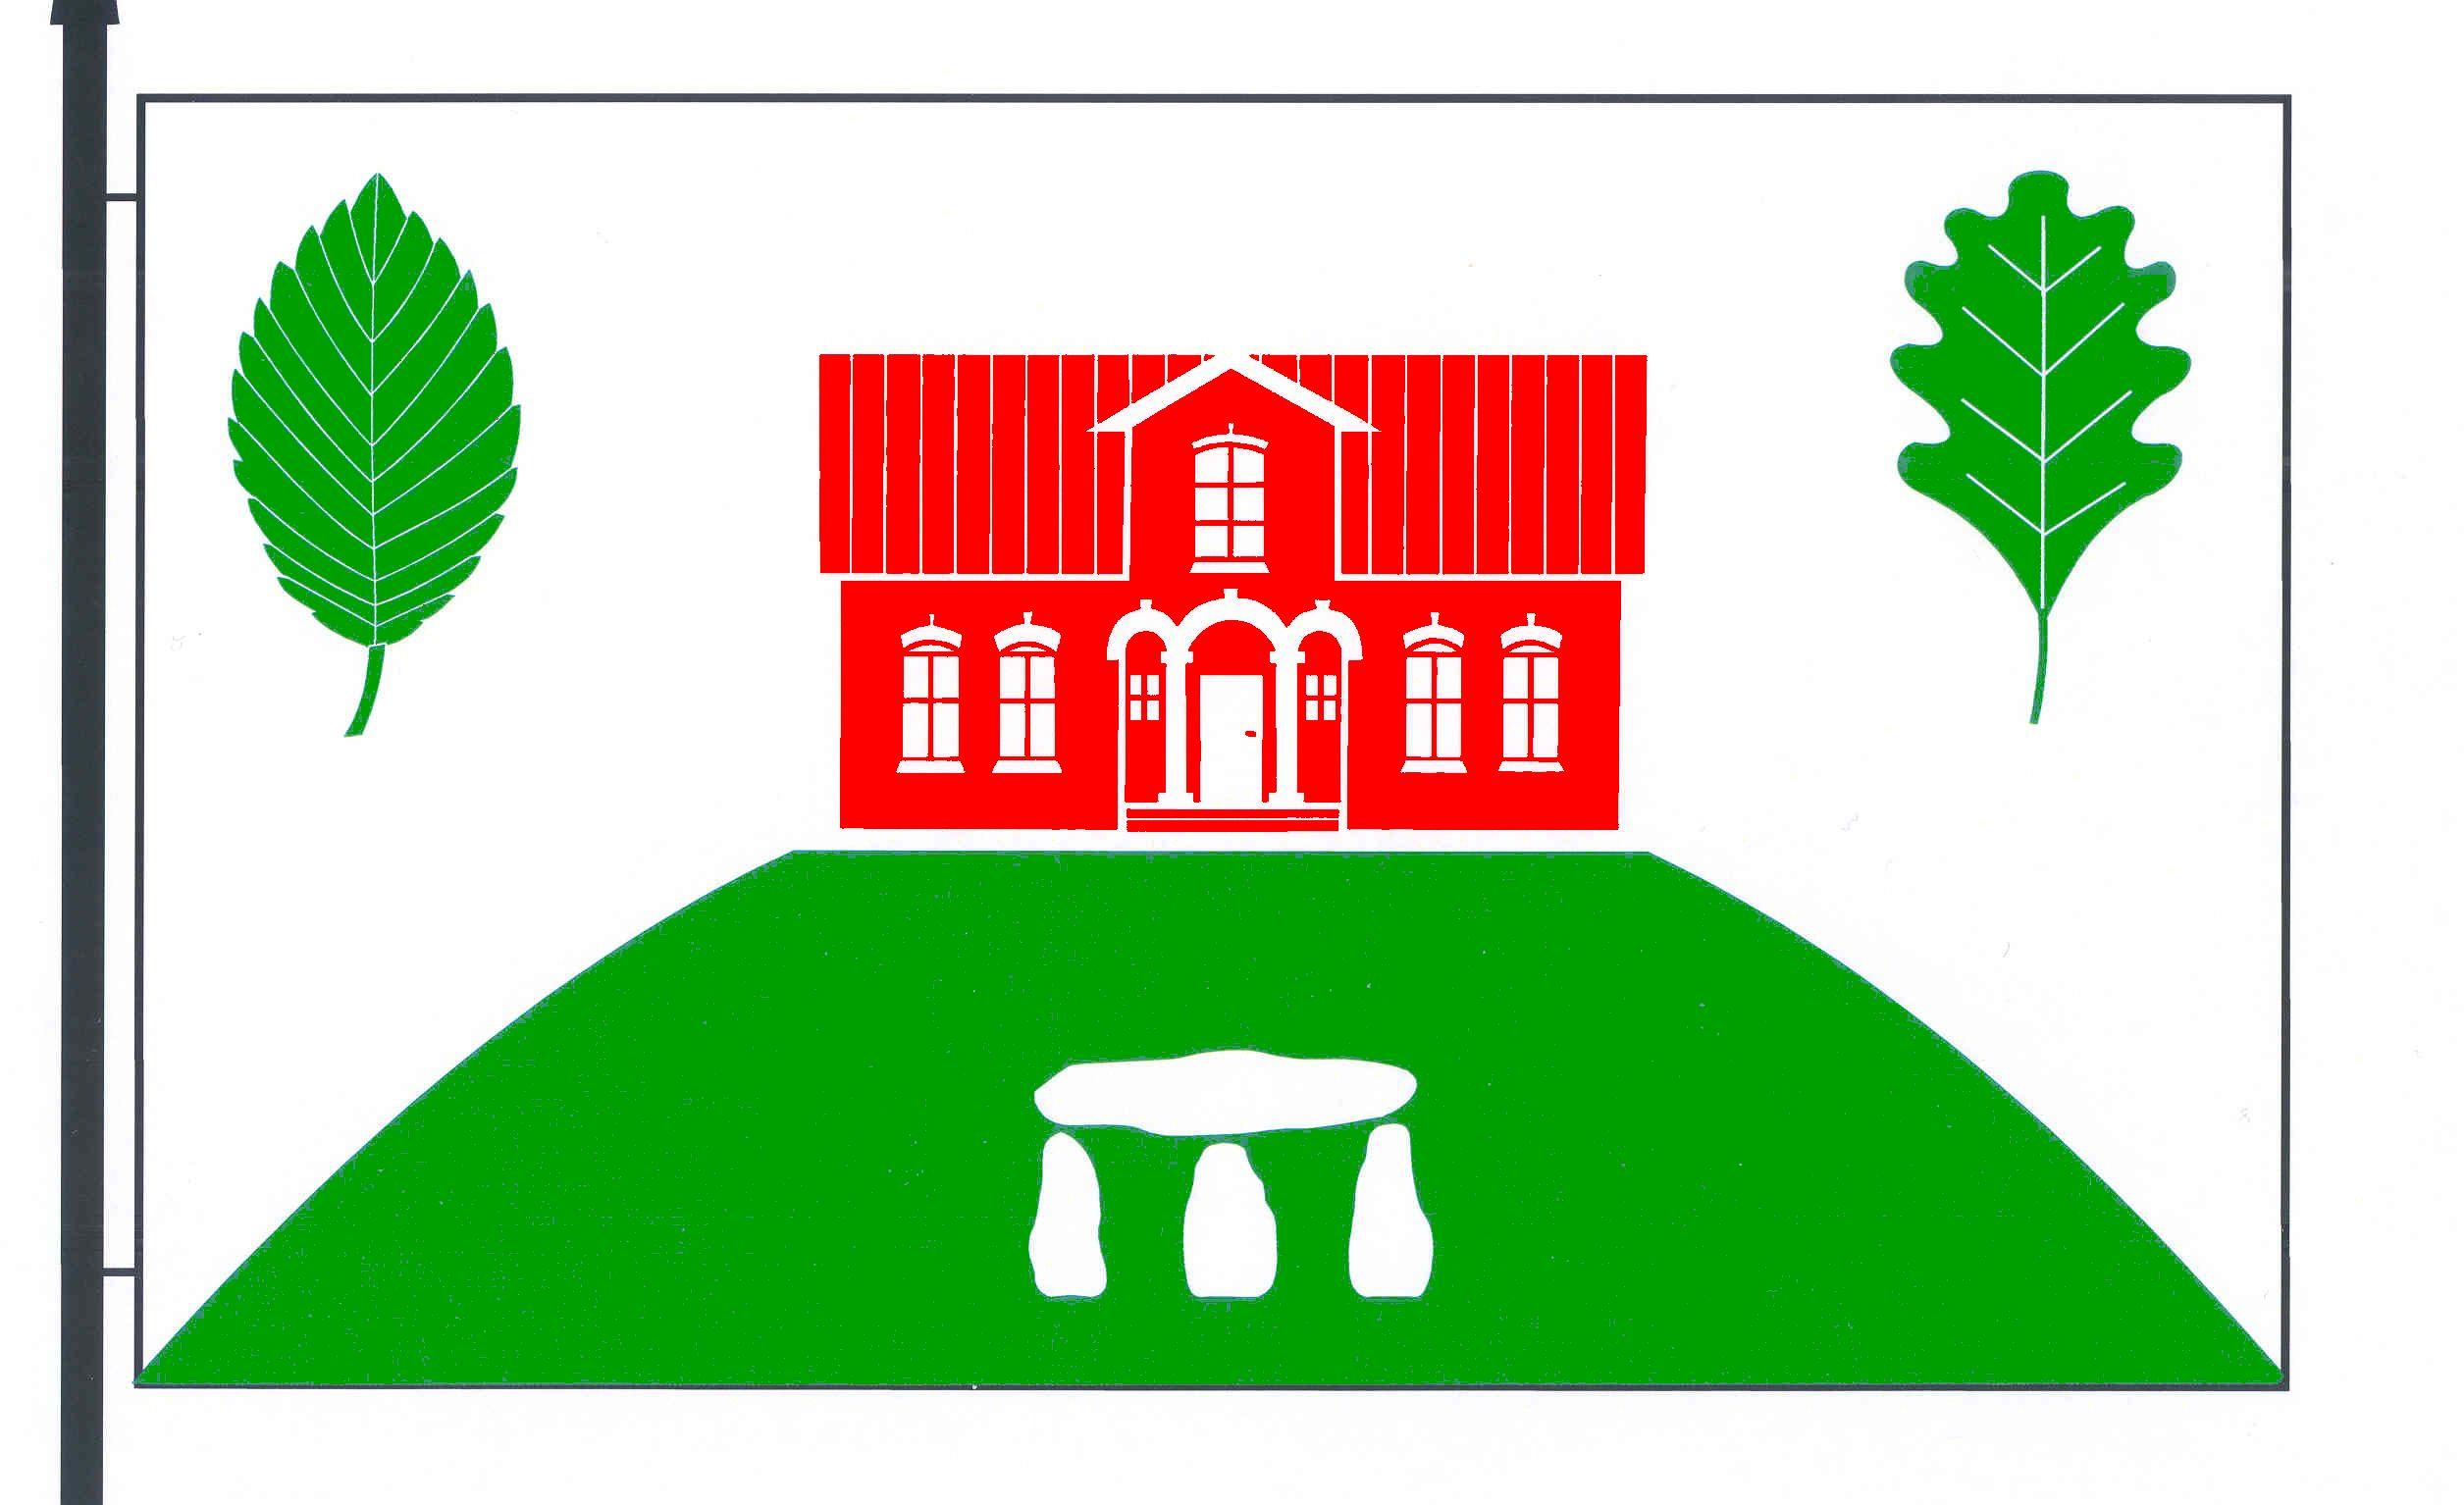 Flagge GemeindeBargstedt, Kreis Rendsburg-Eckernförde